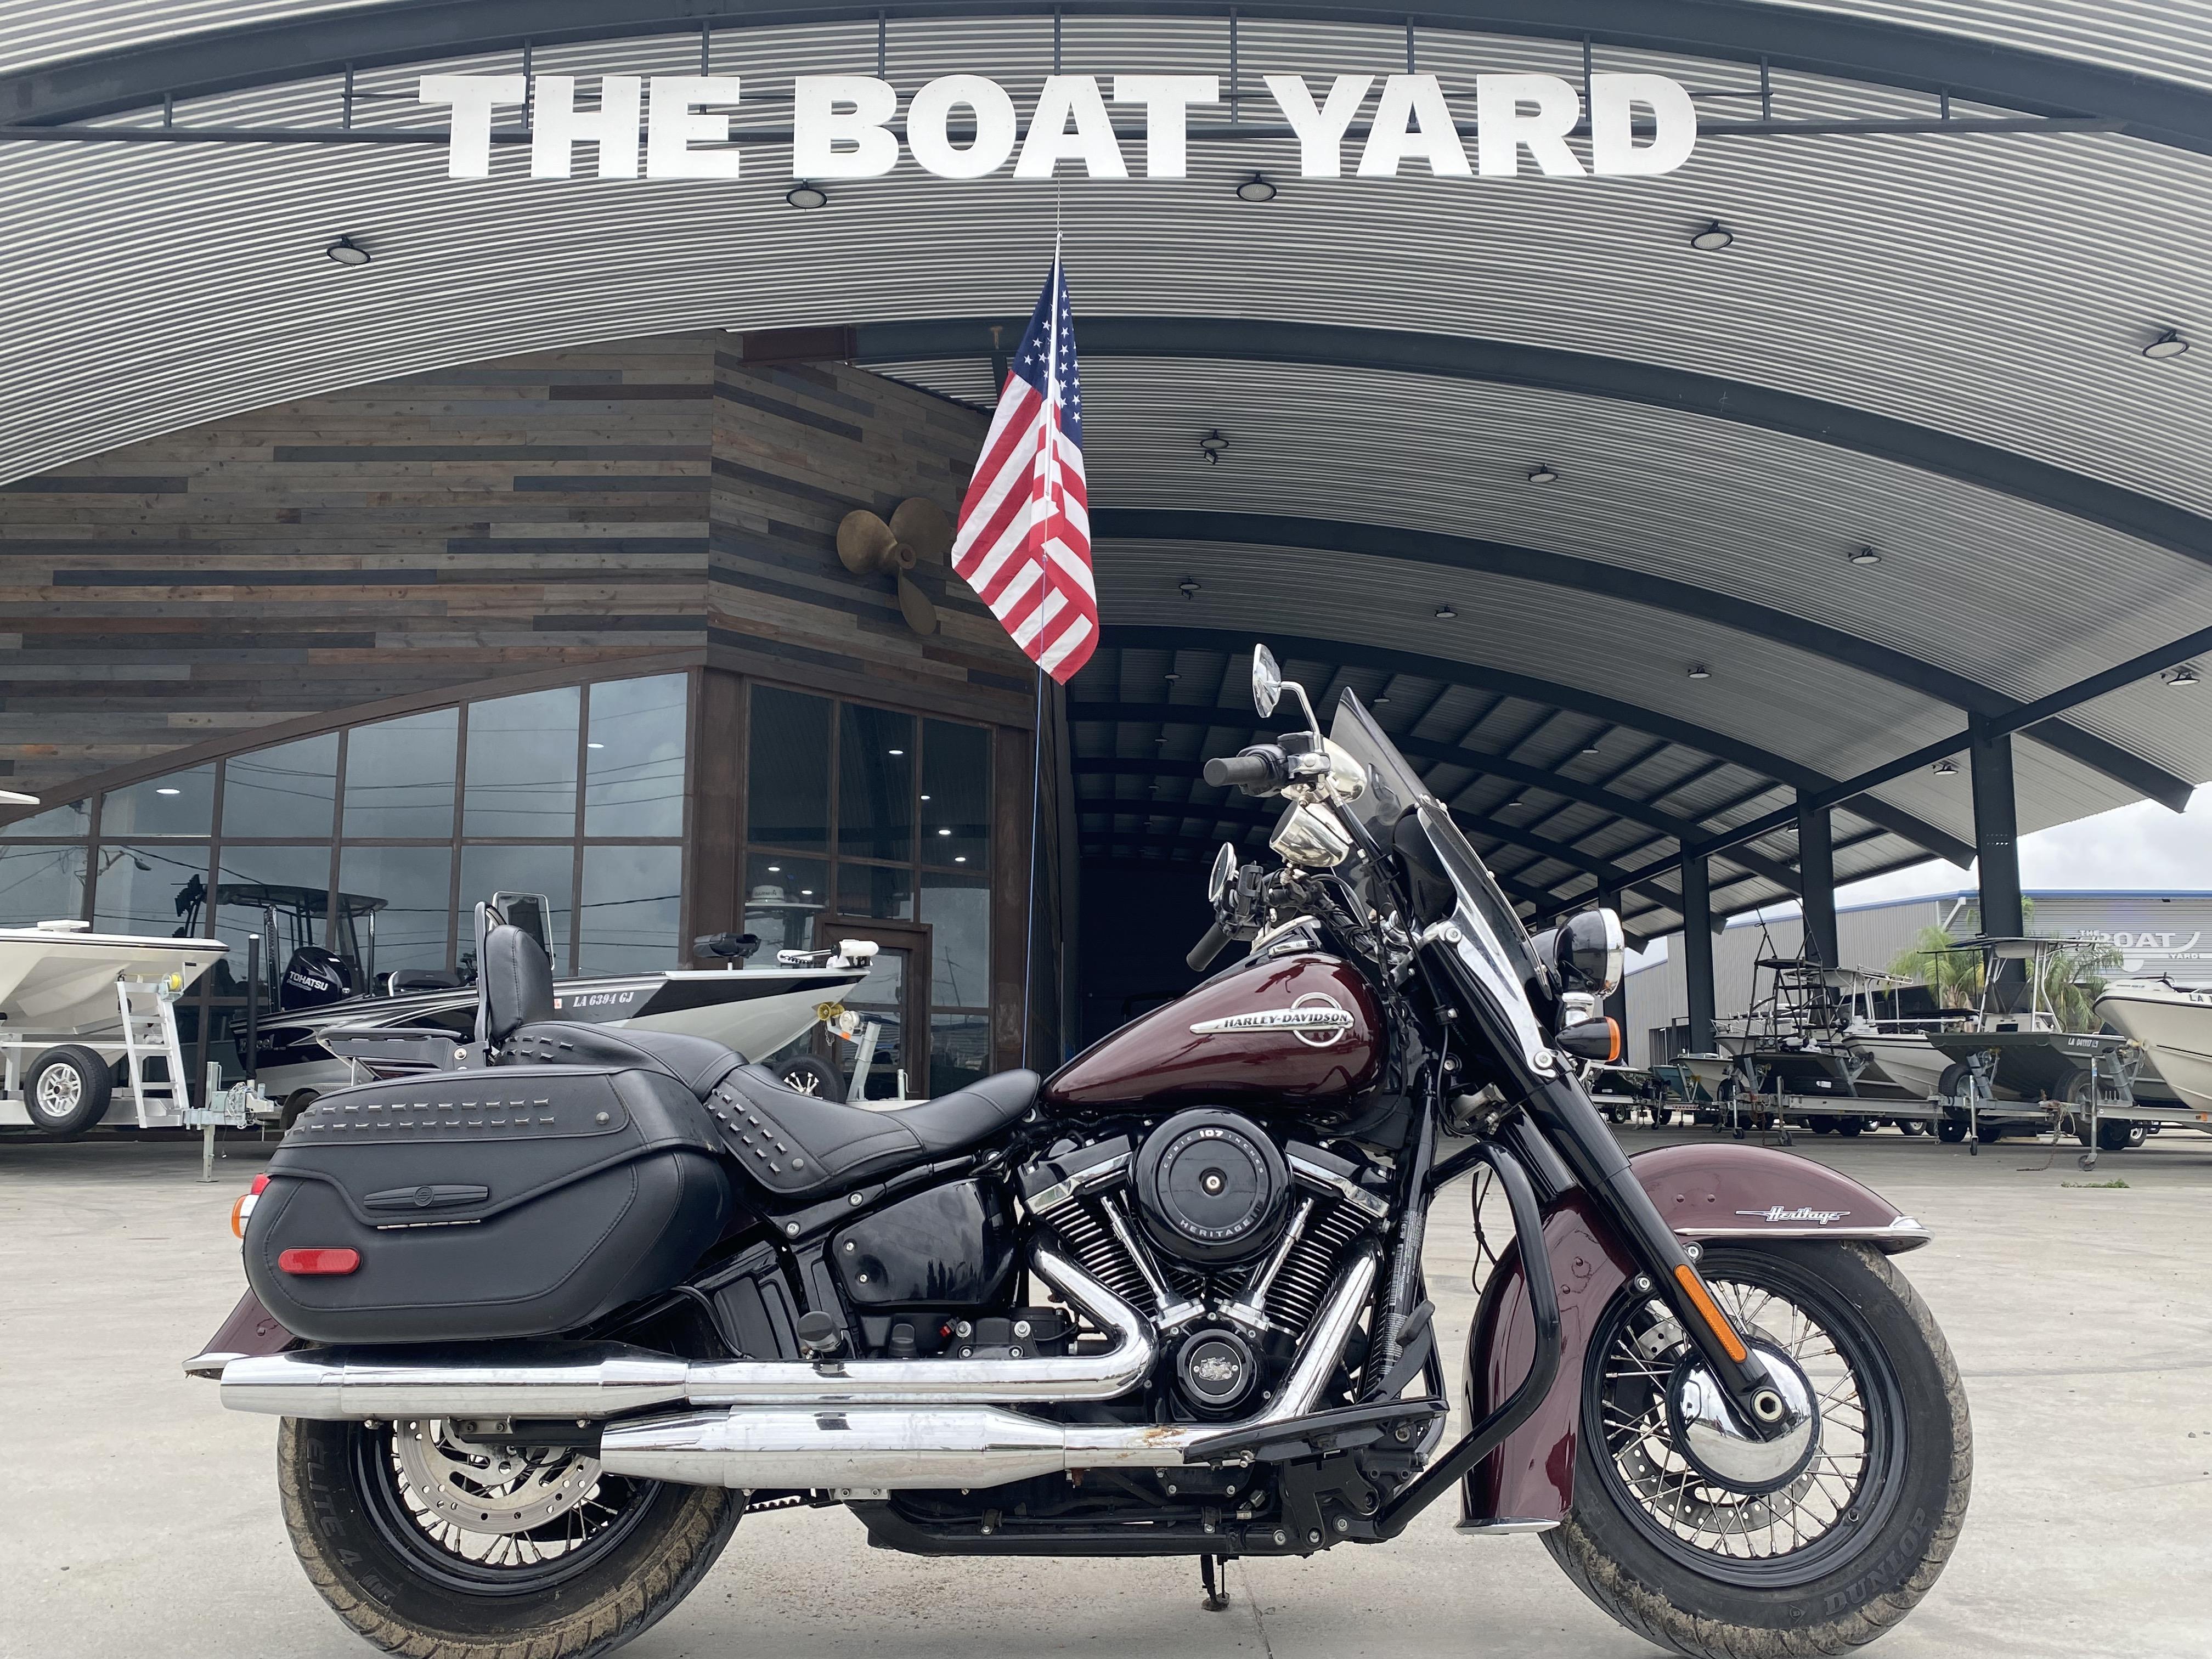 New  2018 Harley-Davidson® Motorcycle Motorcycle in Marrero, Louisiana